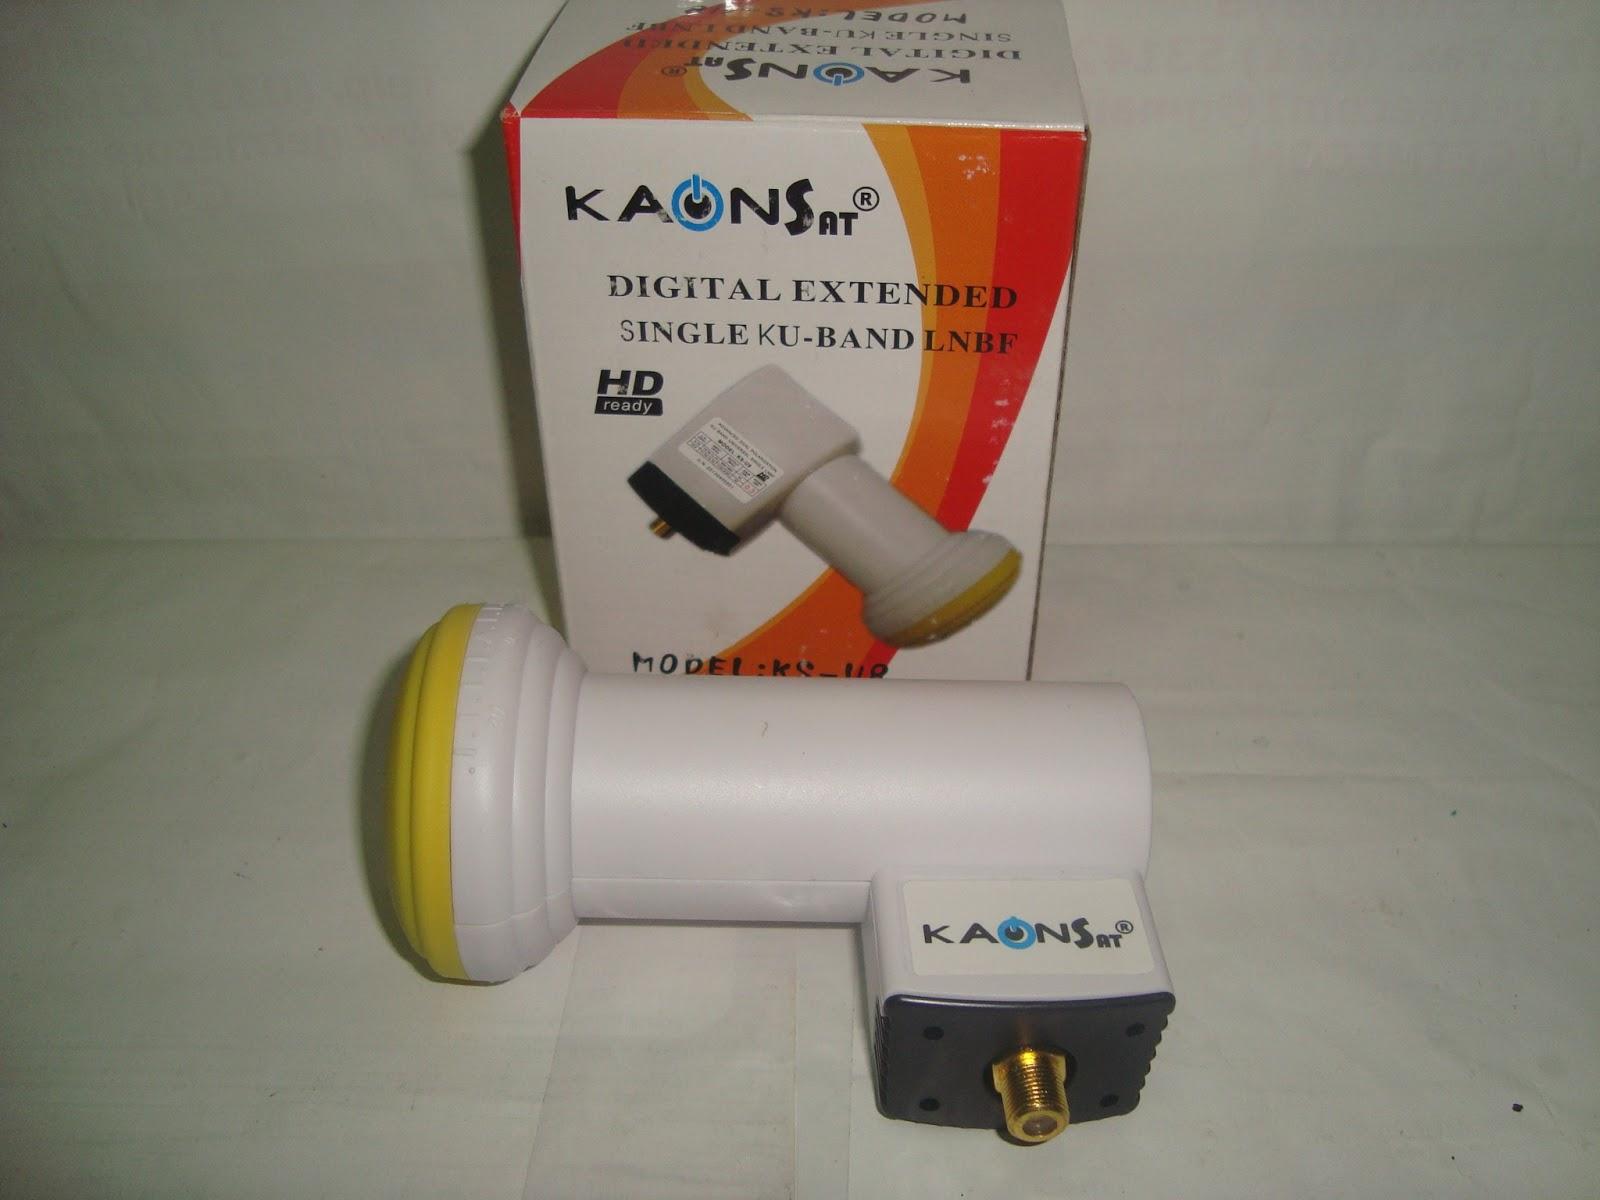 Offset Ku Band Lnb Geek Tattoos Tanaka T60 Spesifikasi Kaonsat